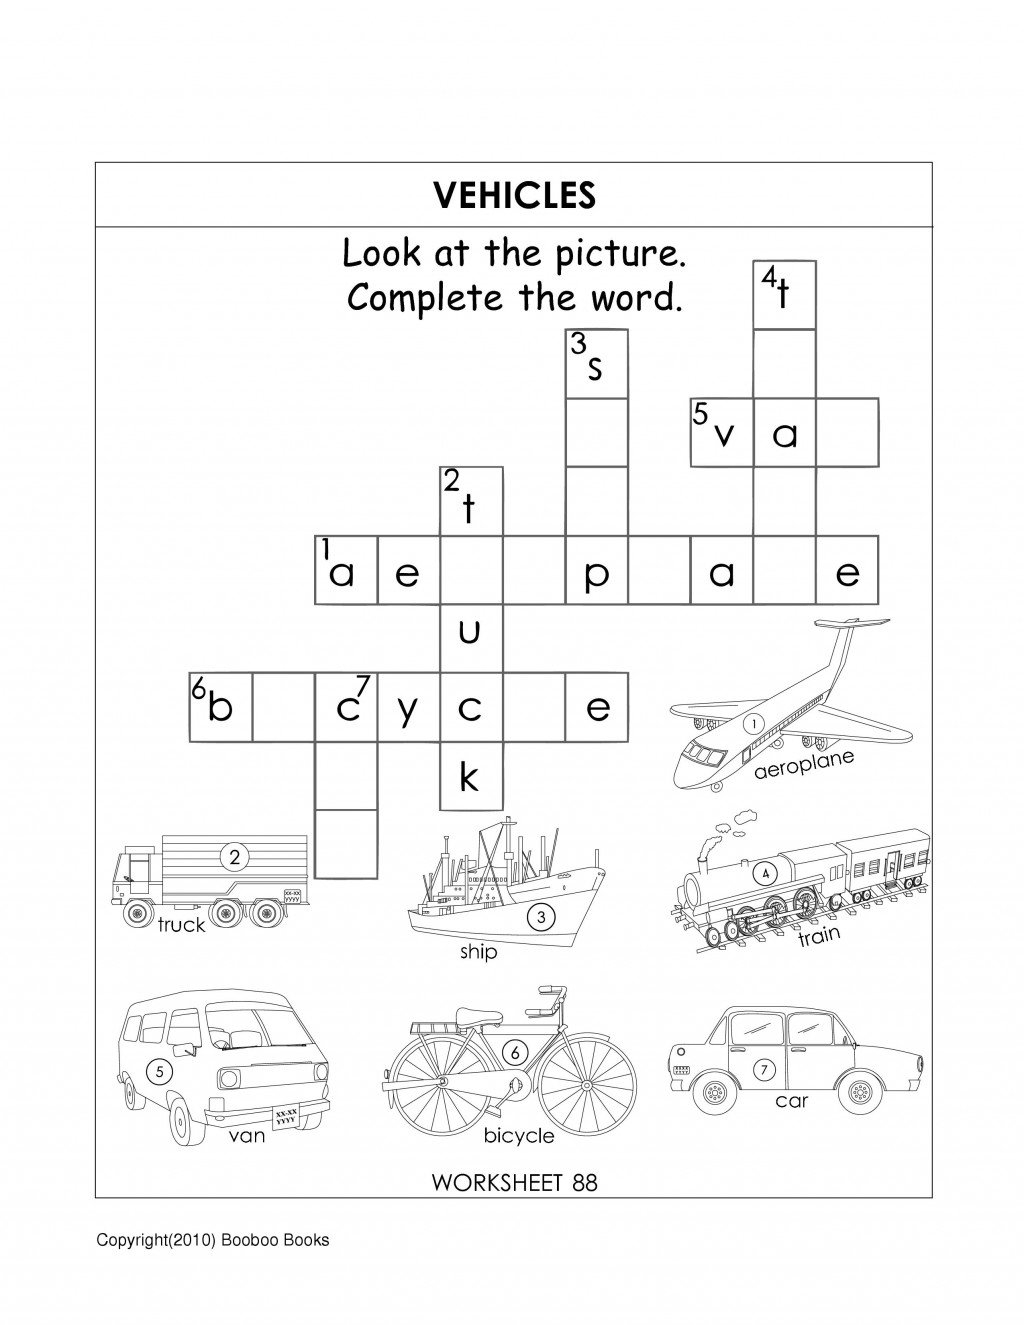 A Guide To Using Printable Kindergarten Worksheets | Wehavekids - Free Printable Name Worksheets For Kindergarten